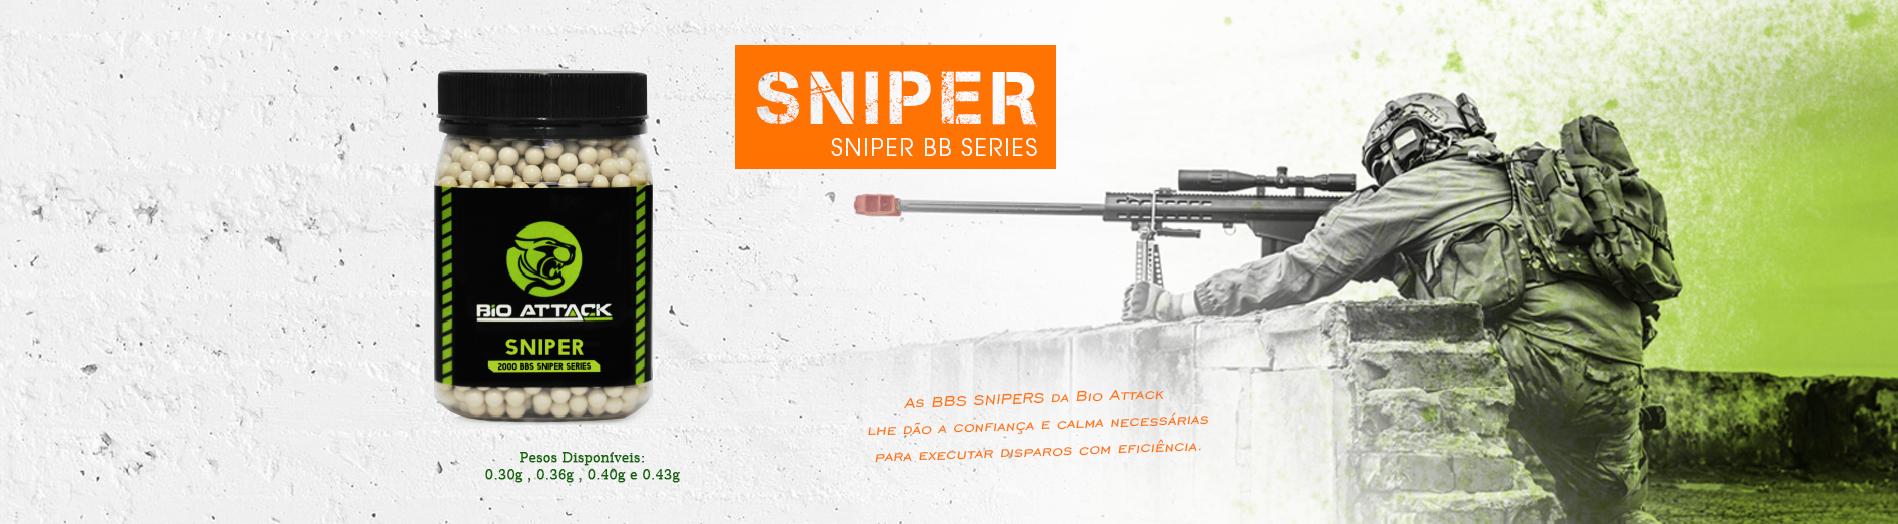 banner-bioattack-bio-attack-sniper-bb-bbs-airsoft